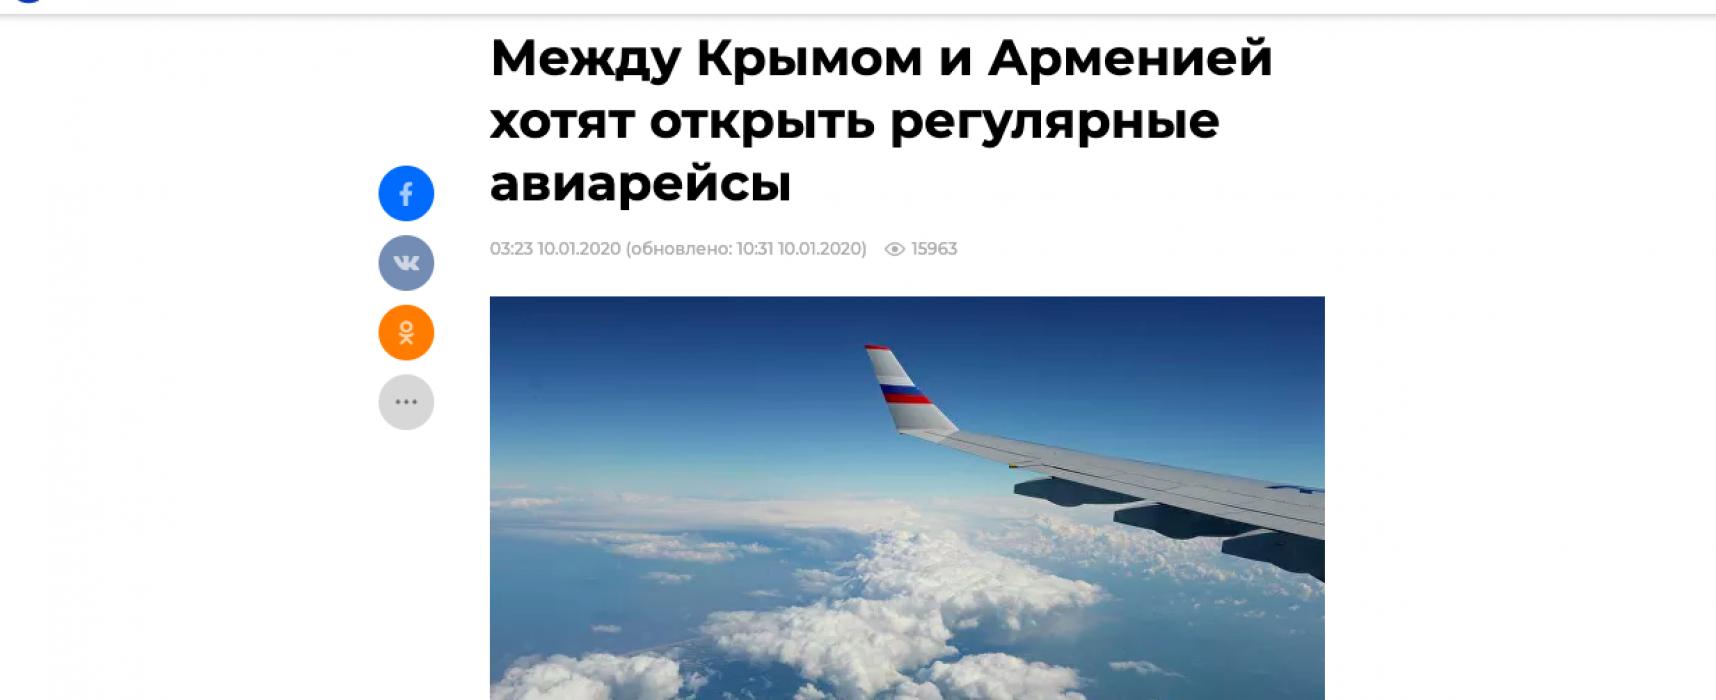 Falso: Armenia reanuda vuelos a Crimea